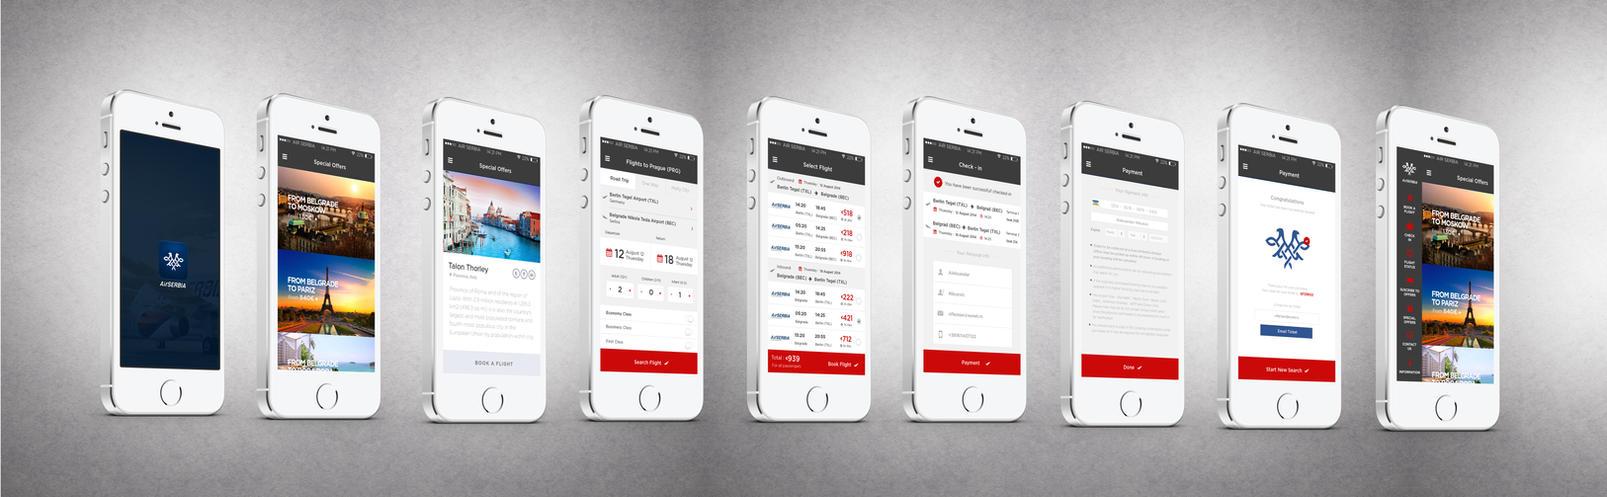 Air Serbia Flight Search App by vasiligfx